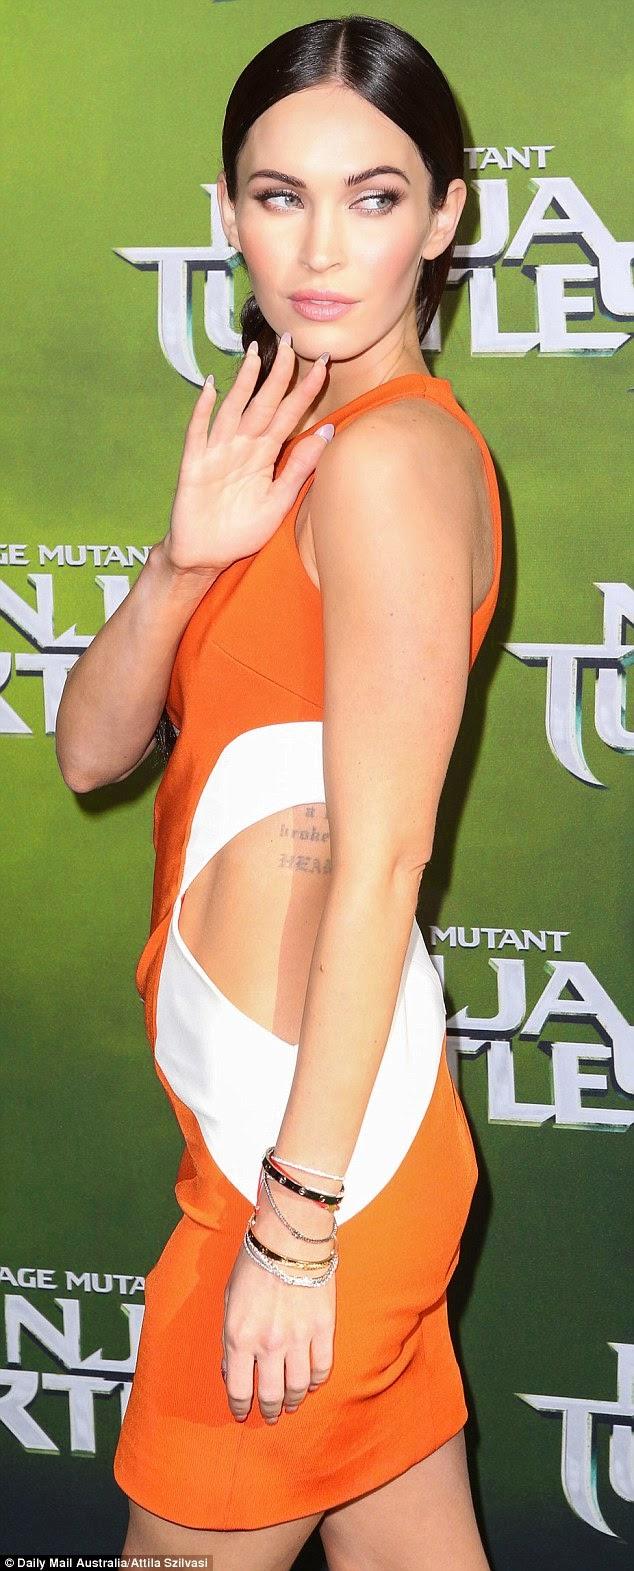 Megan Fox shows off tattoos in an orange cutout dress at the 'Teenage Mutant Ninja Turtles' Sydney premiere